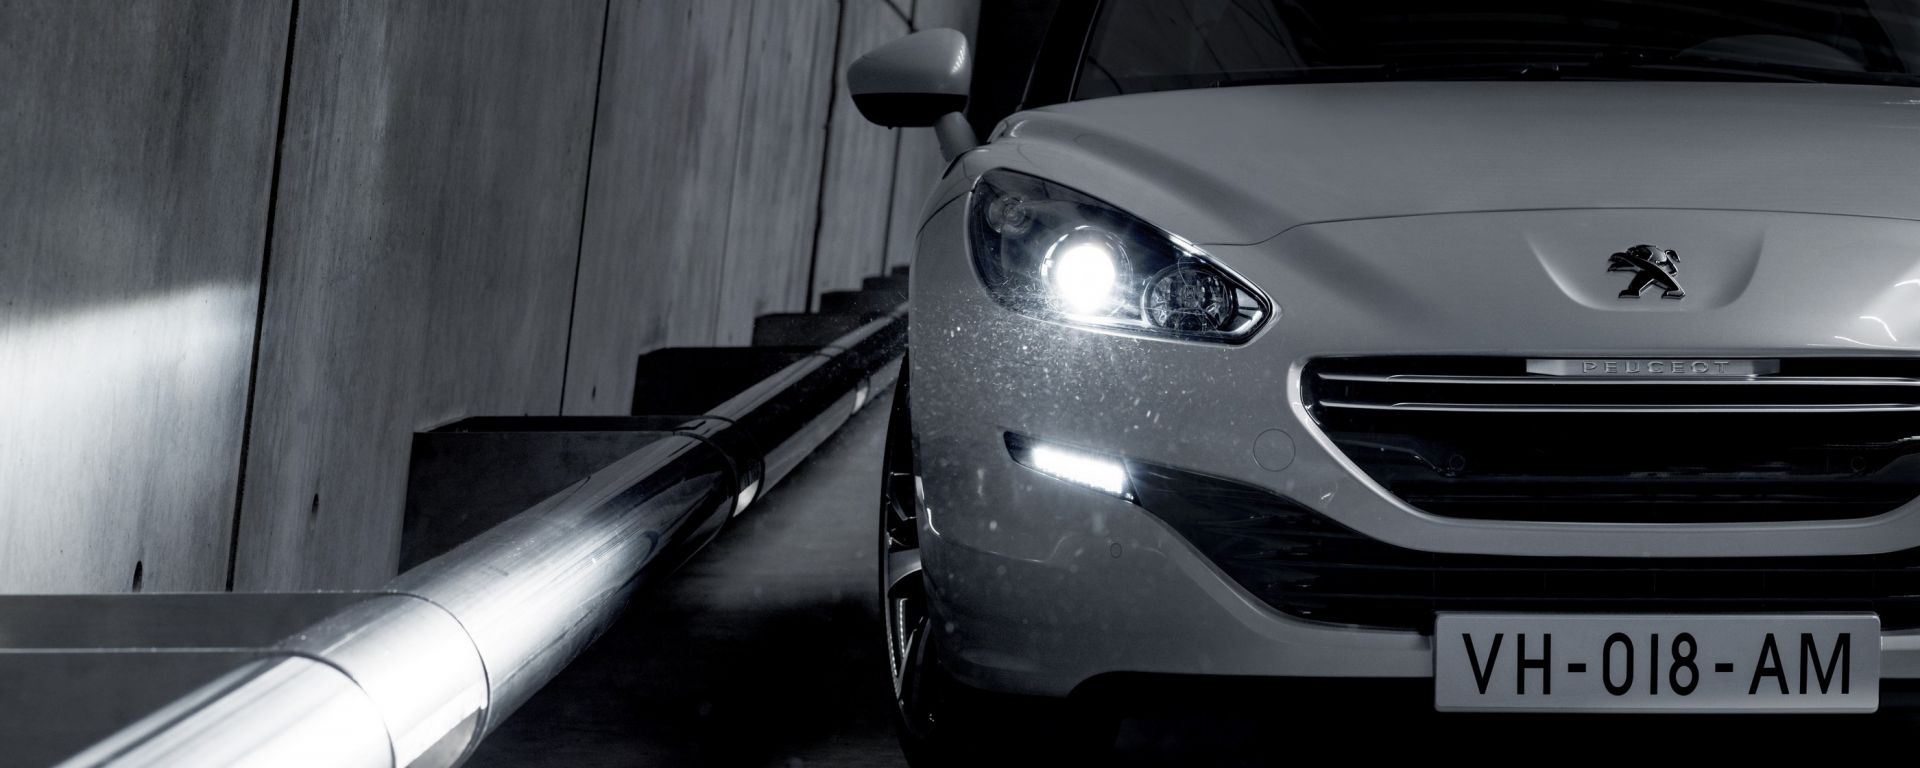 Peugeot RCZ 2013 e RCZ R concept